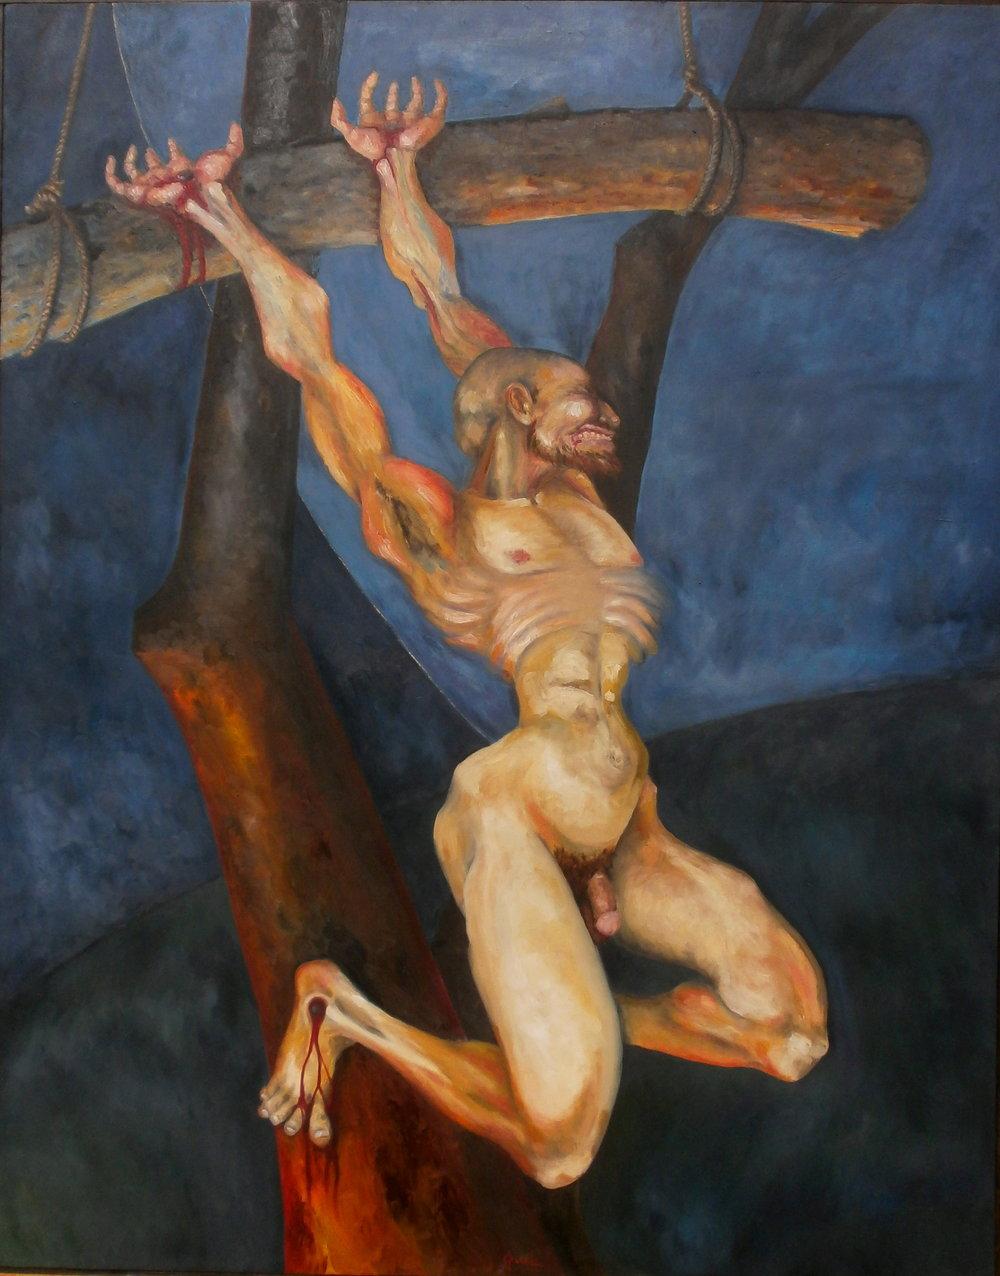 Crucifixion #7